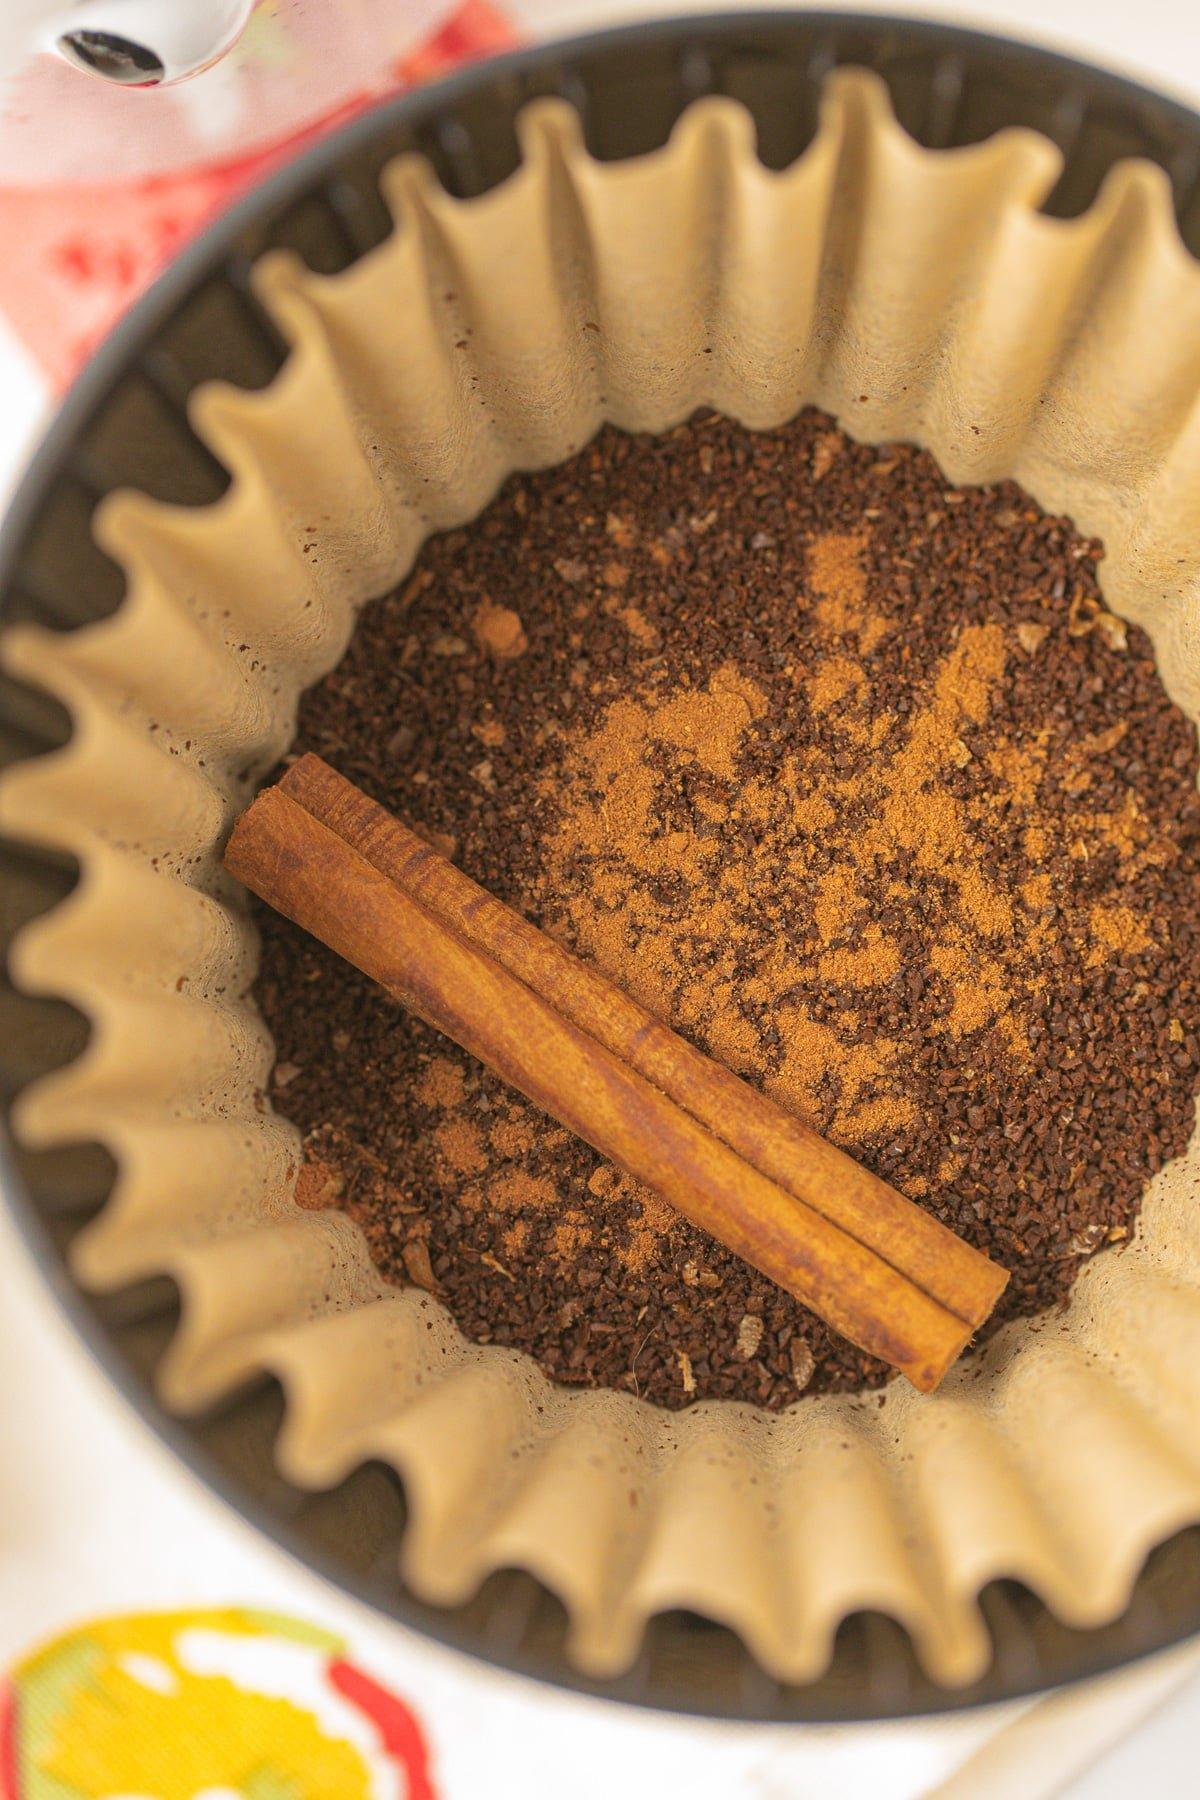 Pumpkin Spice Drip Coffee Recipe